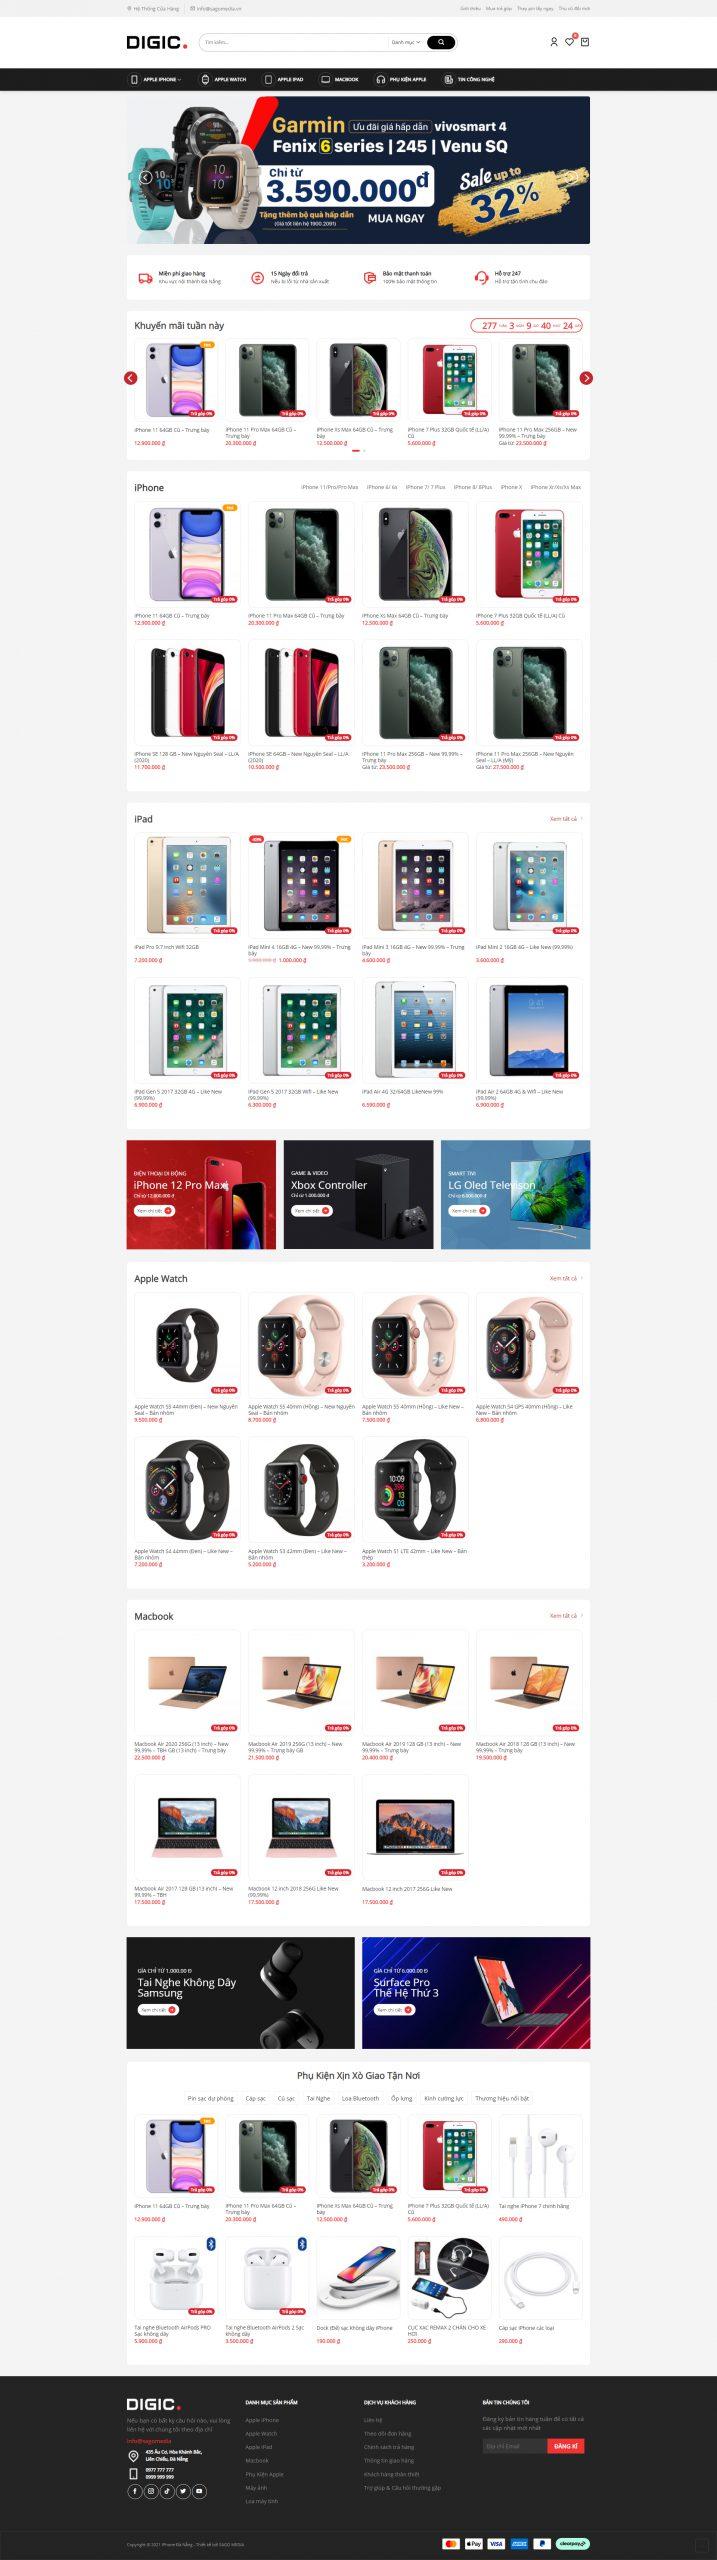 Giao diện website Sago19 Full